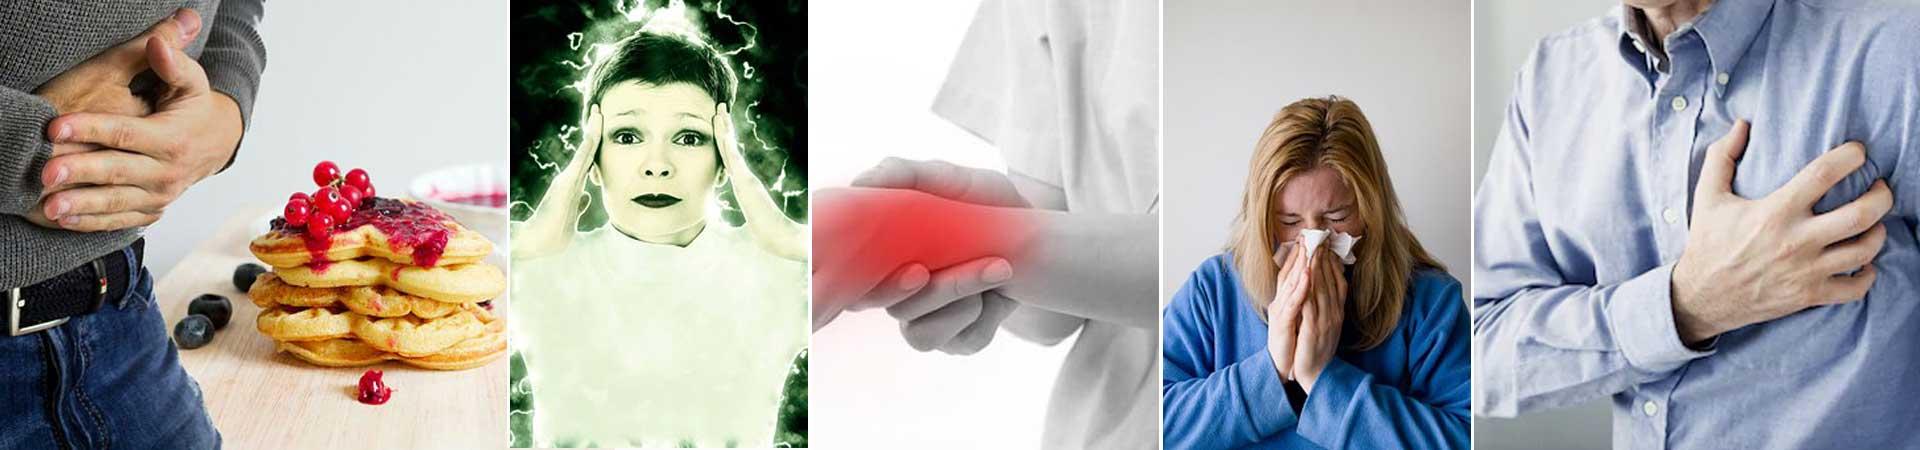 medical_condition_treated_main_slider_rev